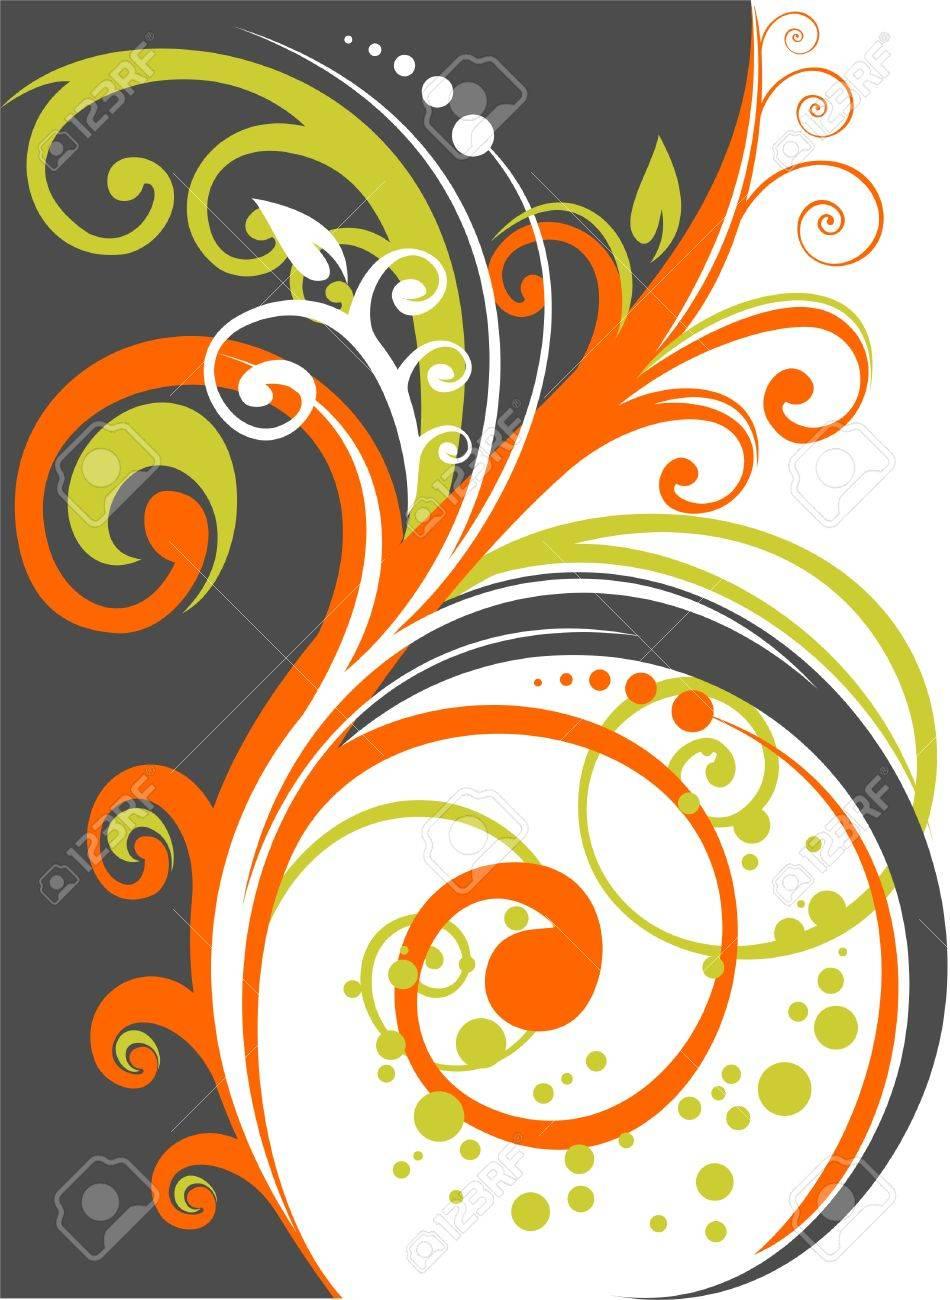 The decorative stylized vegetative pattern on a white background. Stock Vector - 1934528